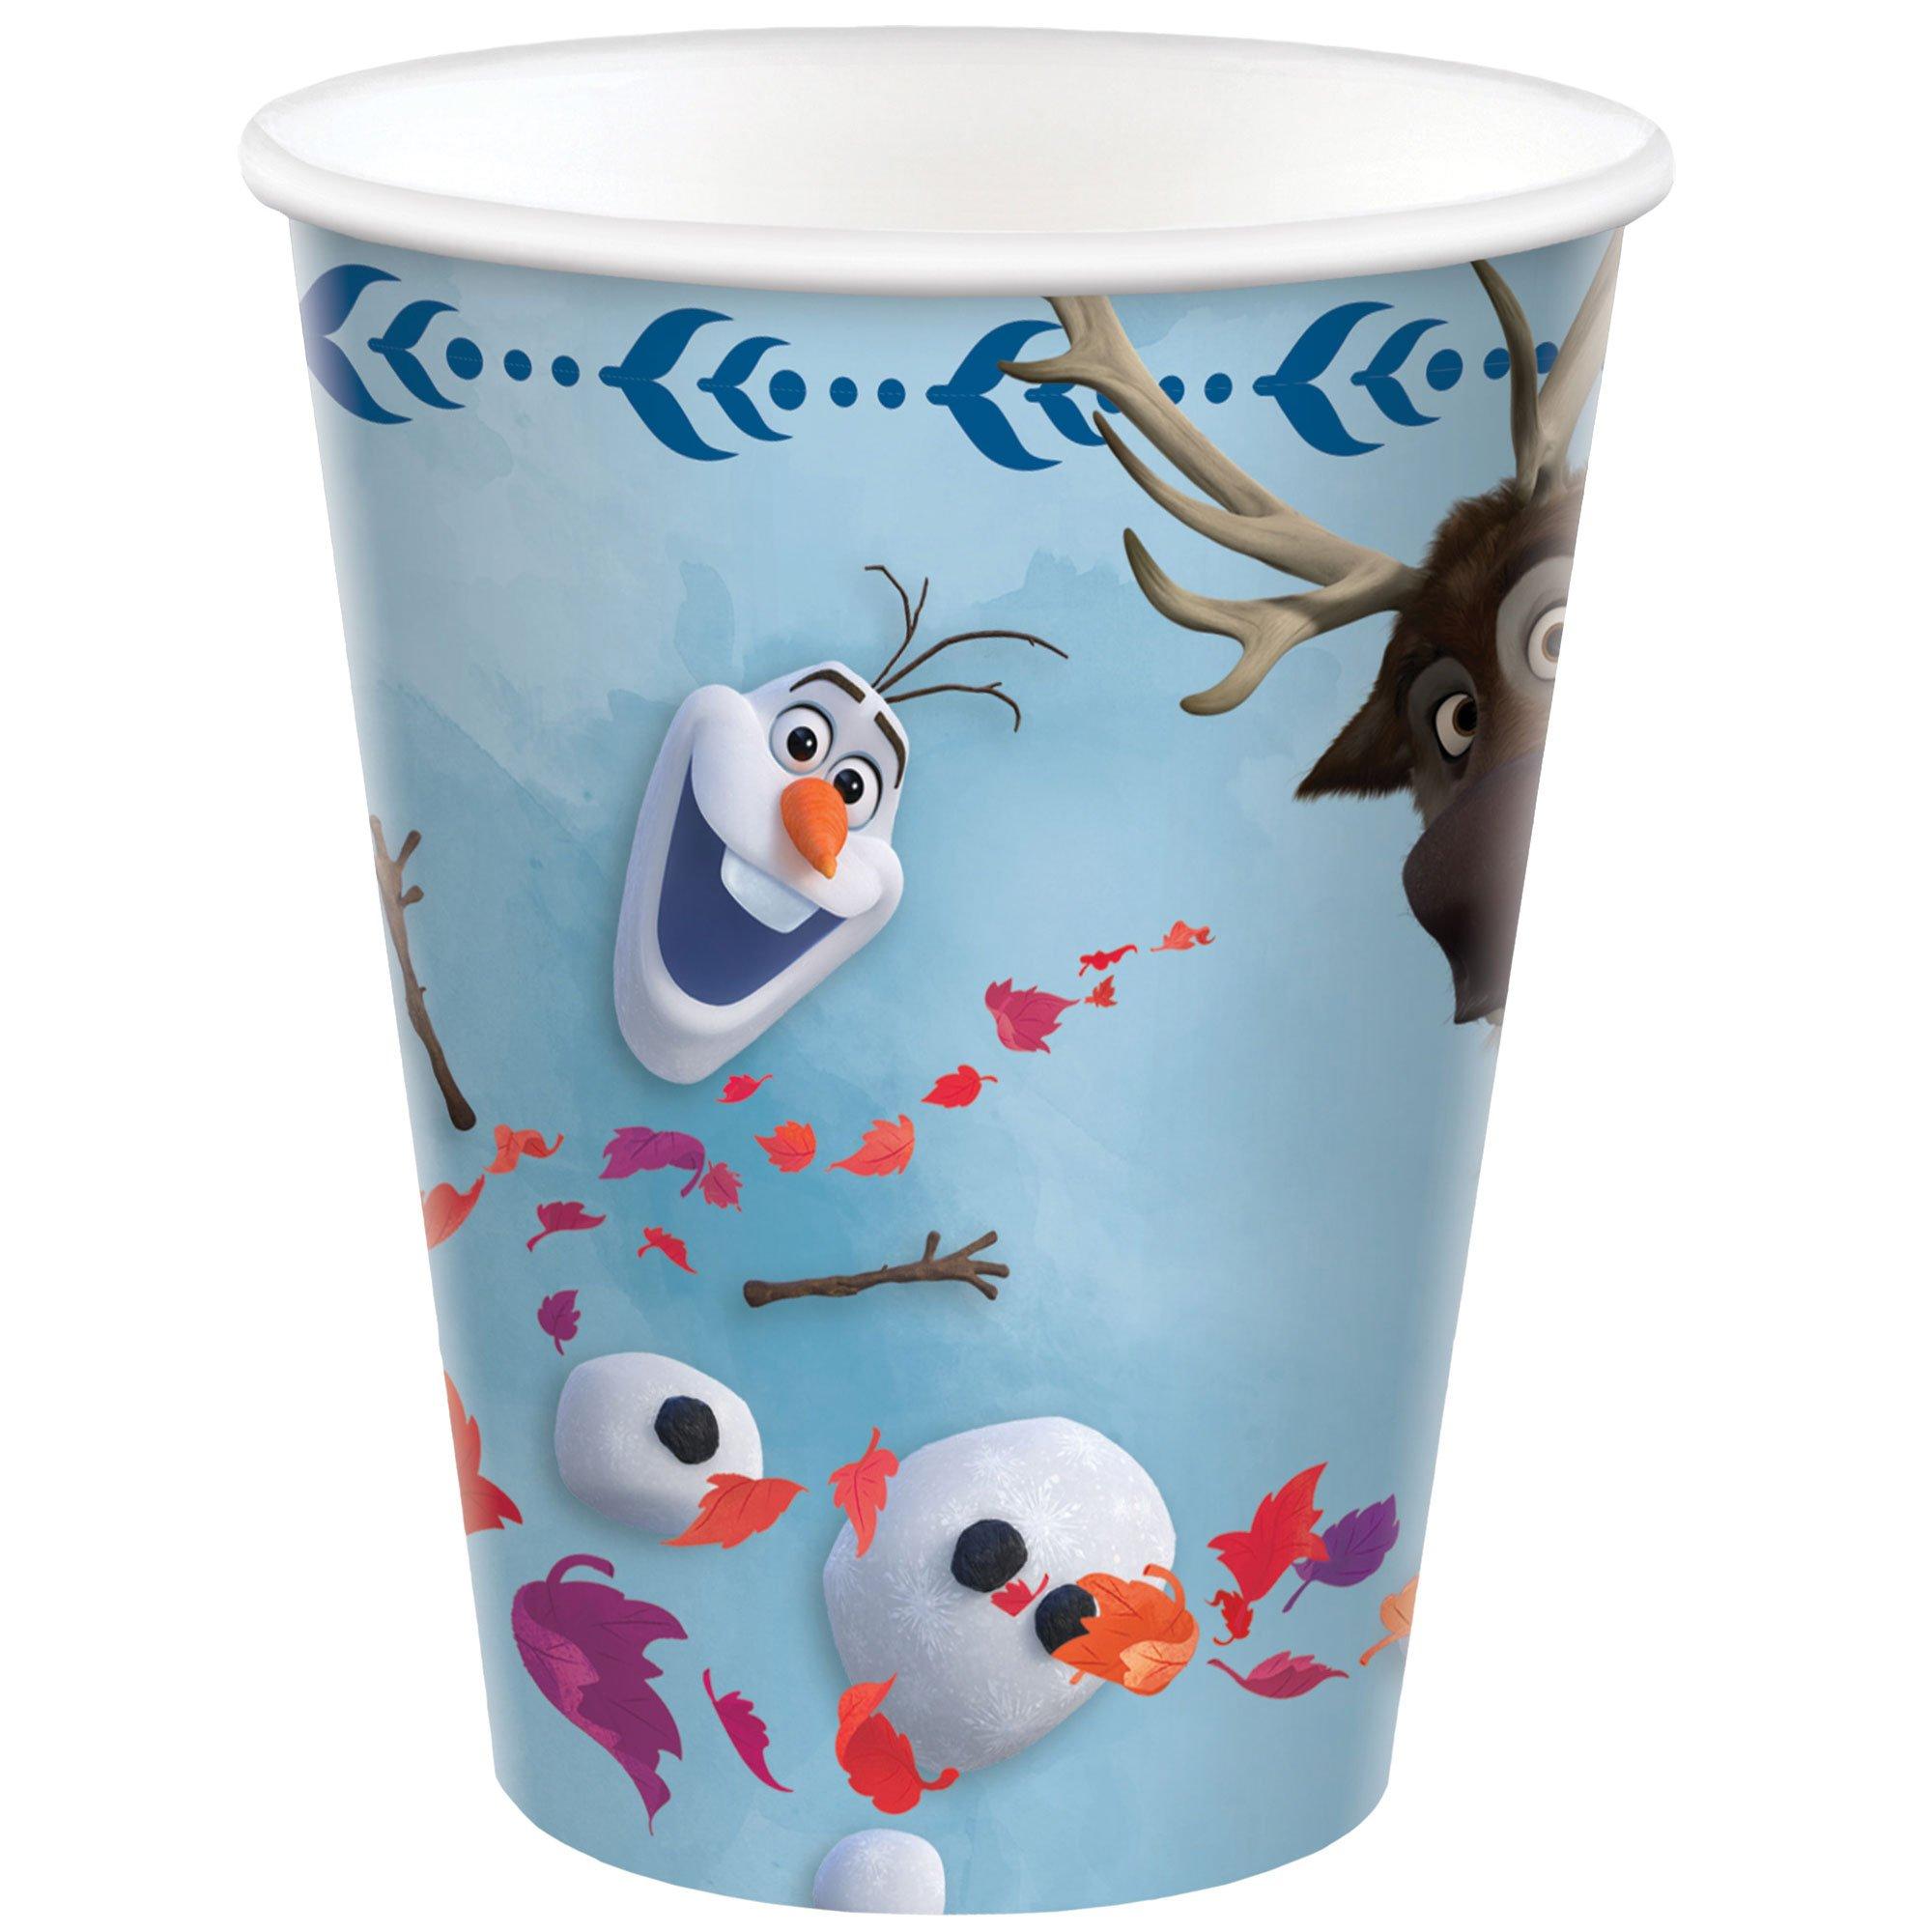 Frozen 2 9oz / 266ml Paper Cups